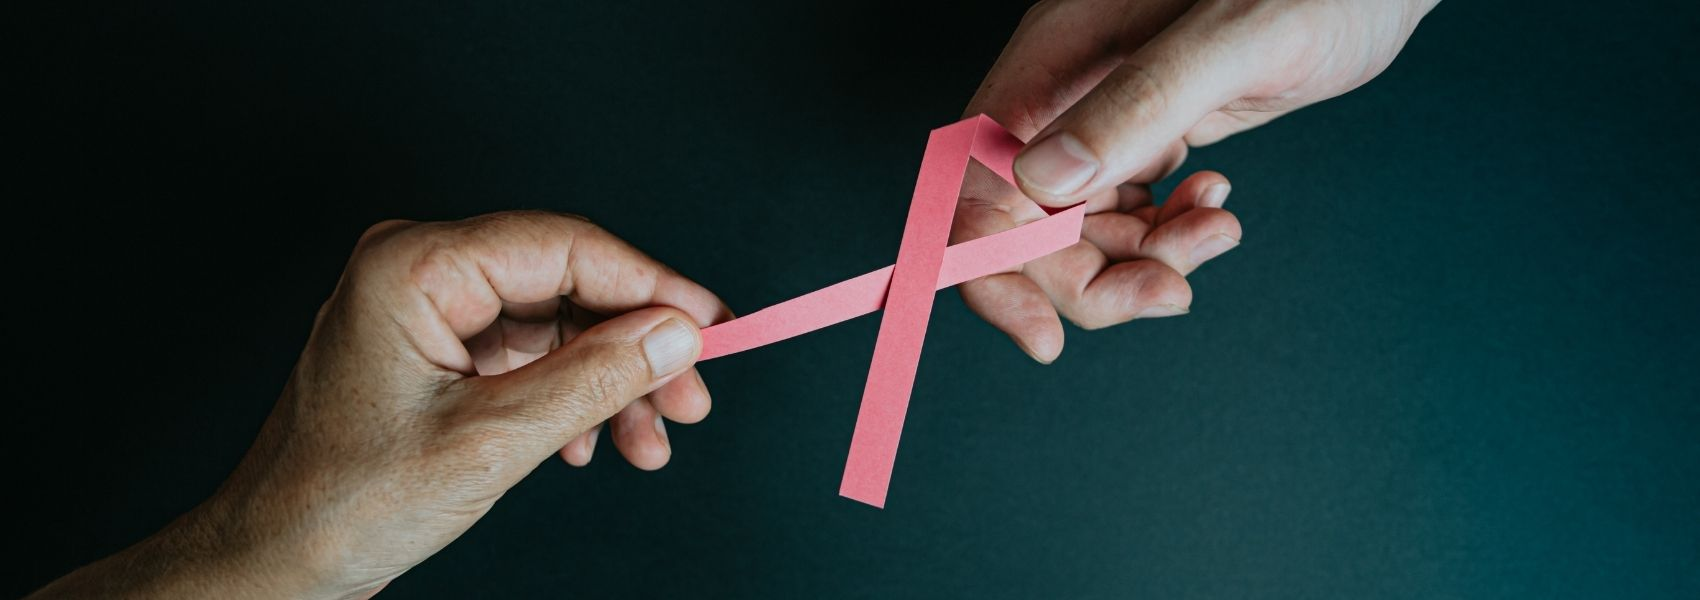 rastreio do cancro